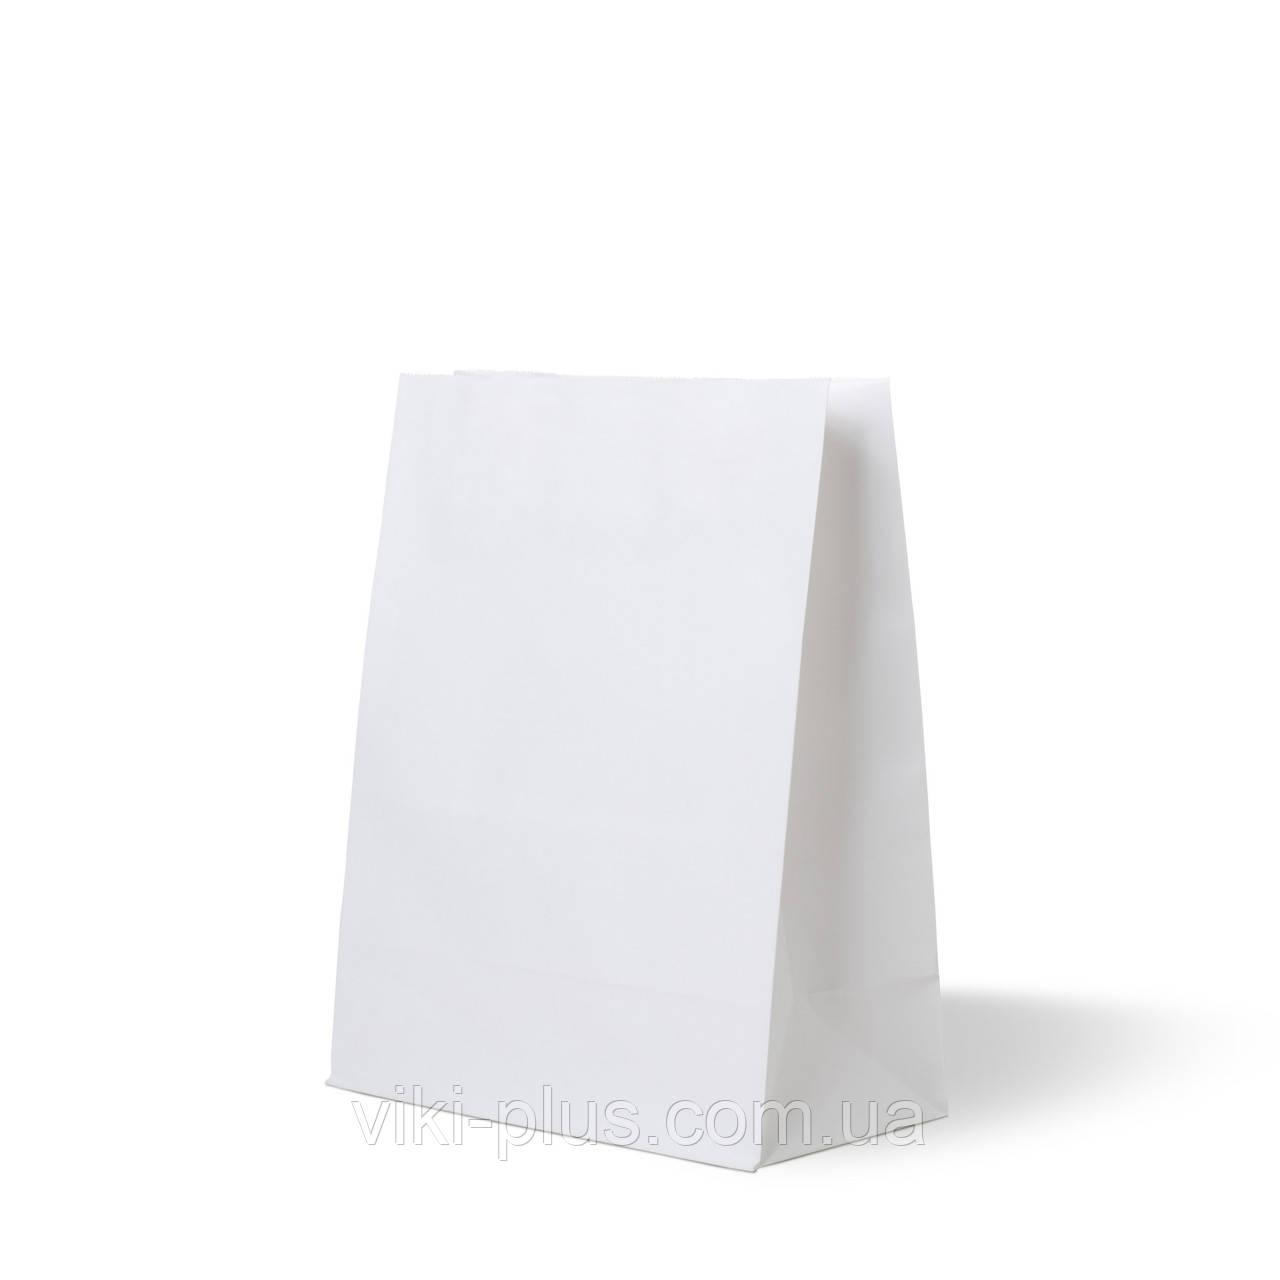 Пакет бумажный 22*8*38 см белый(1000шт/уп)